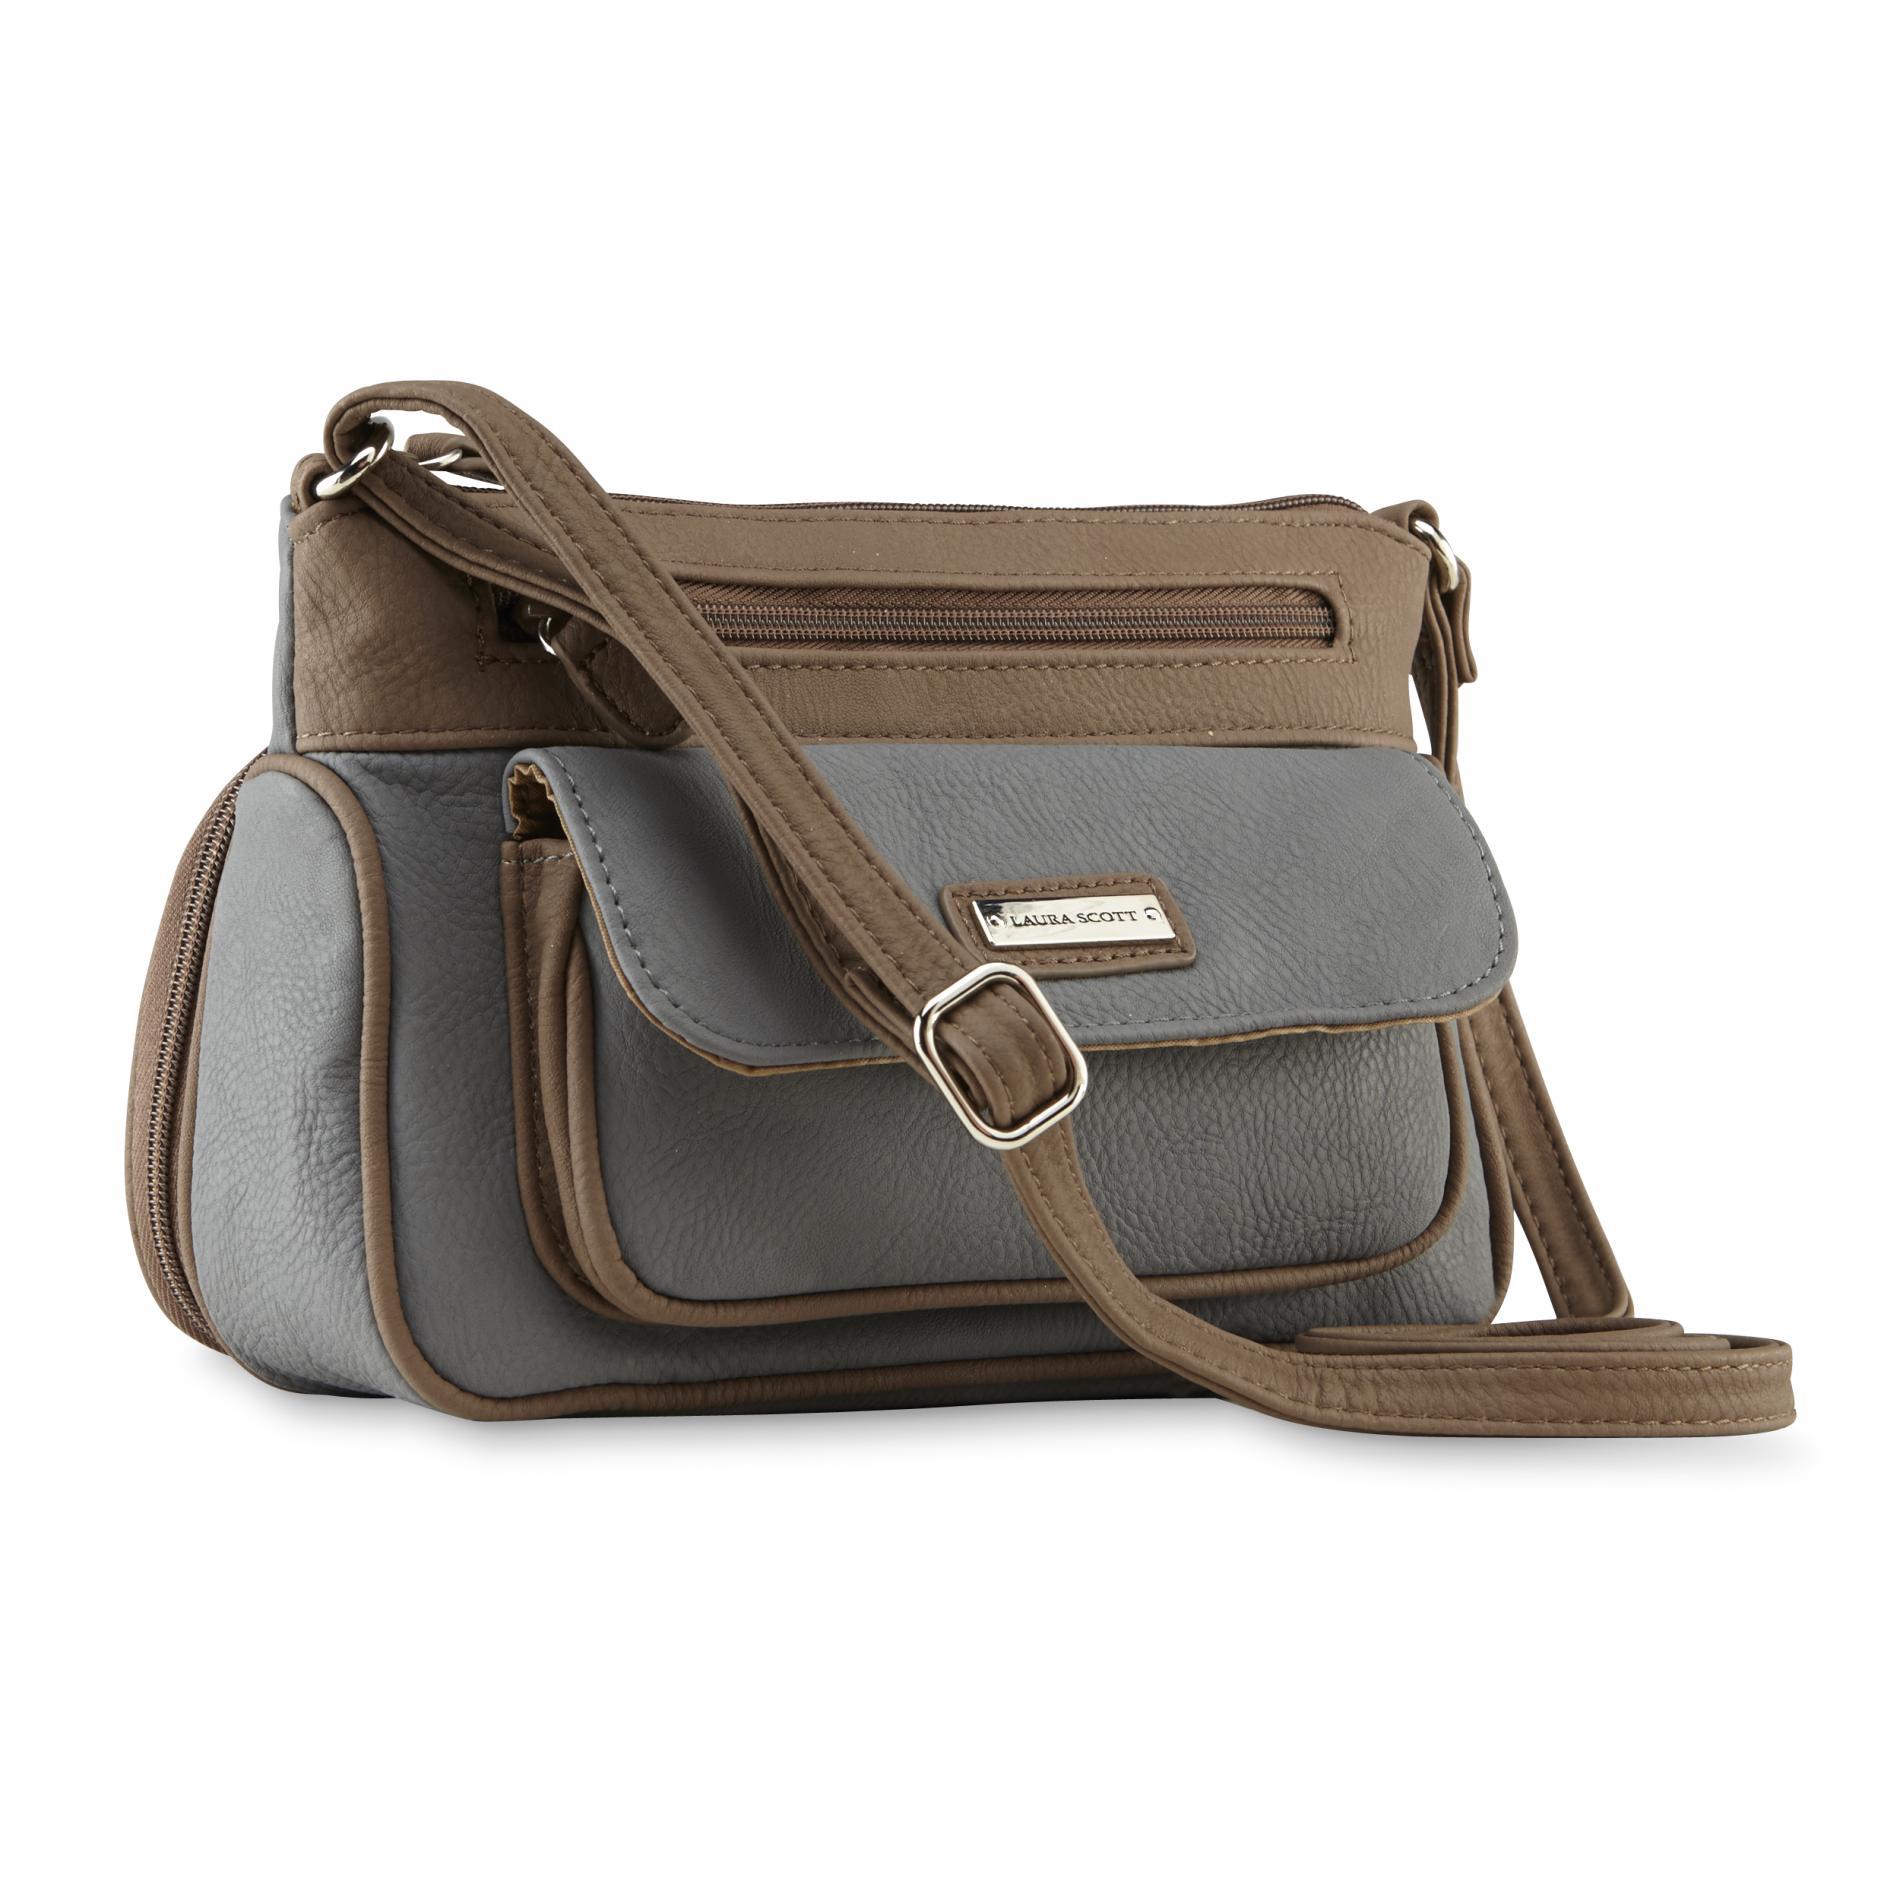 BAGS - Handbags Laura Scott